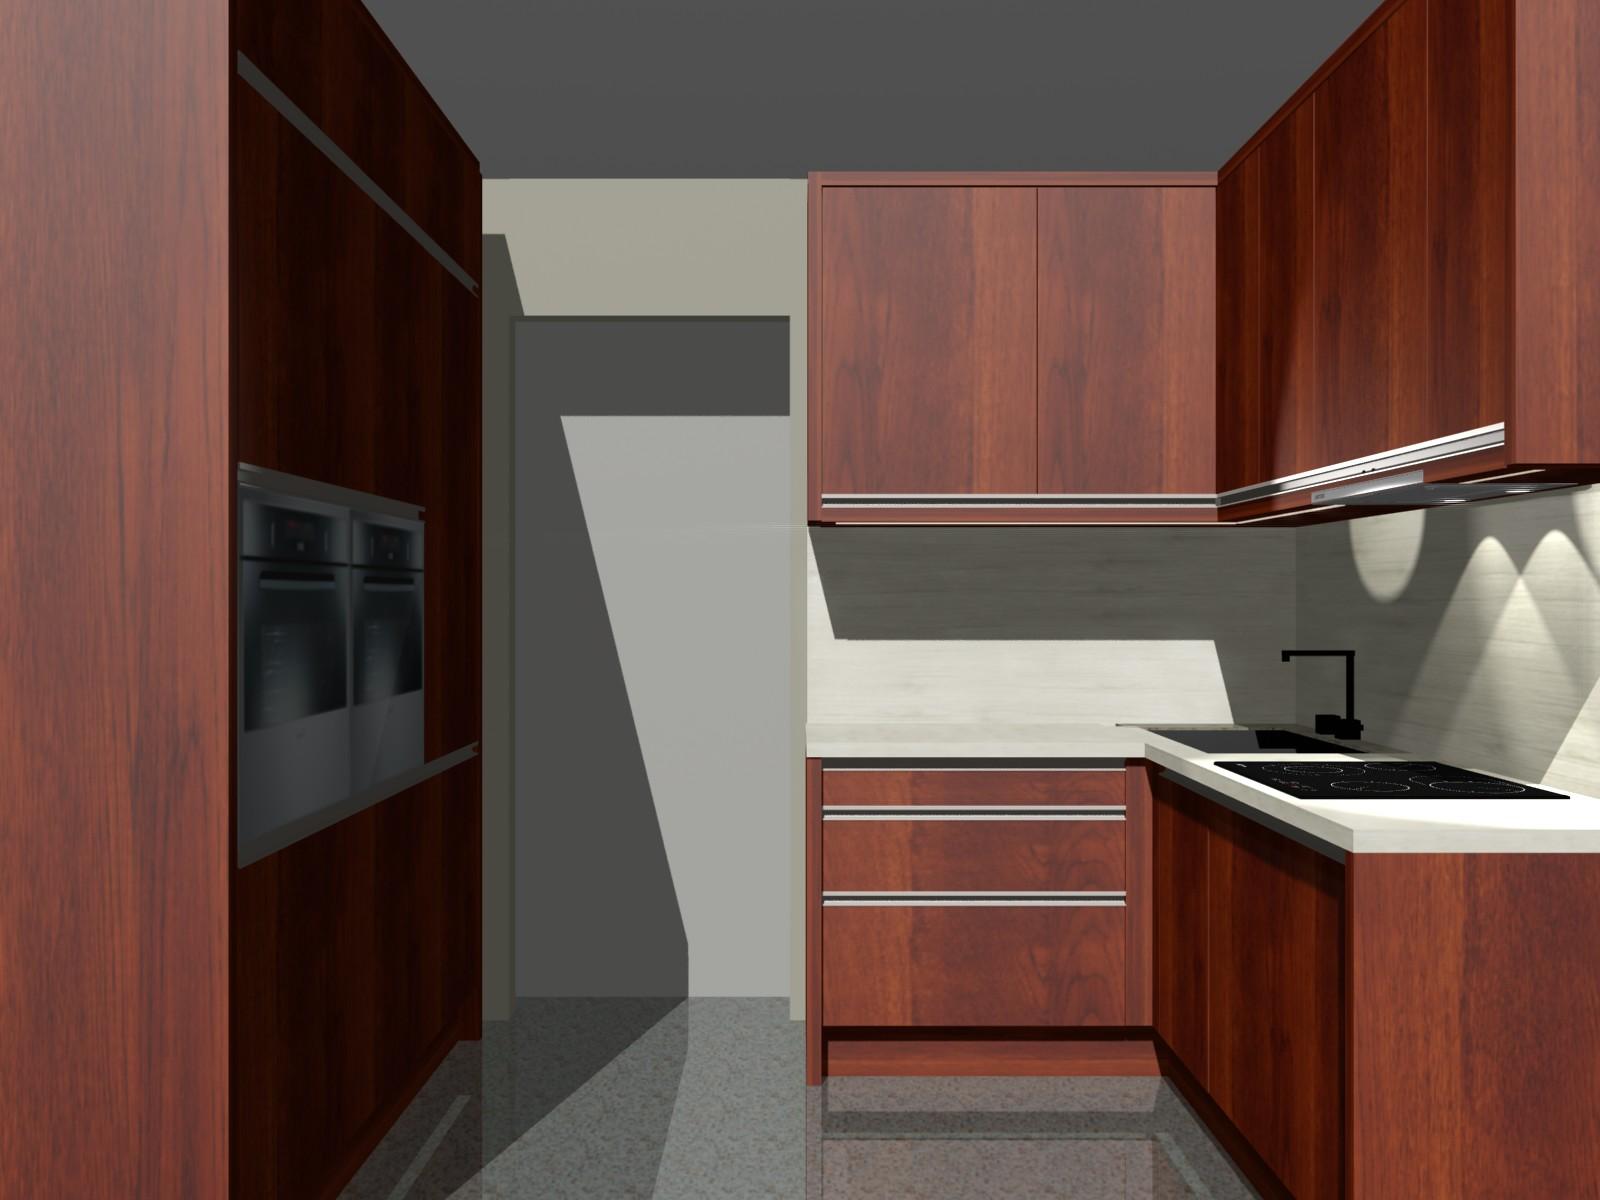 kuchnia w bloku (3)